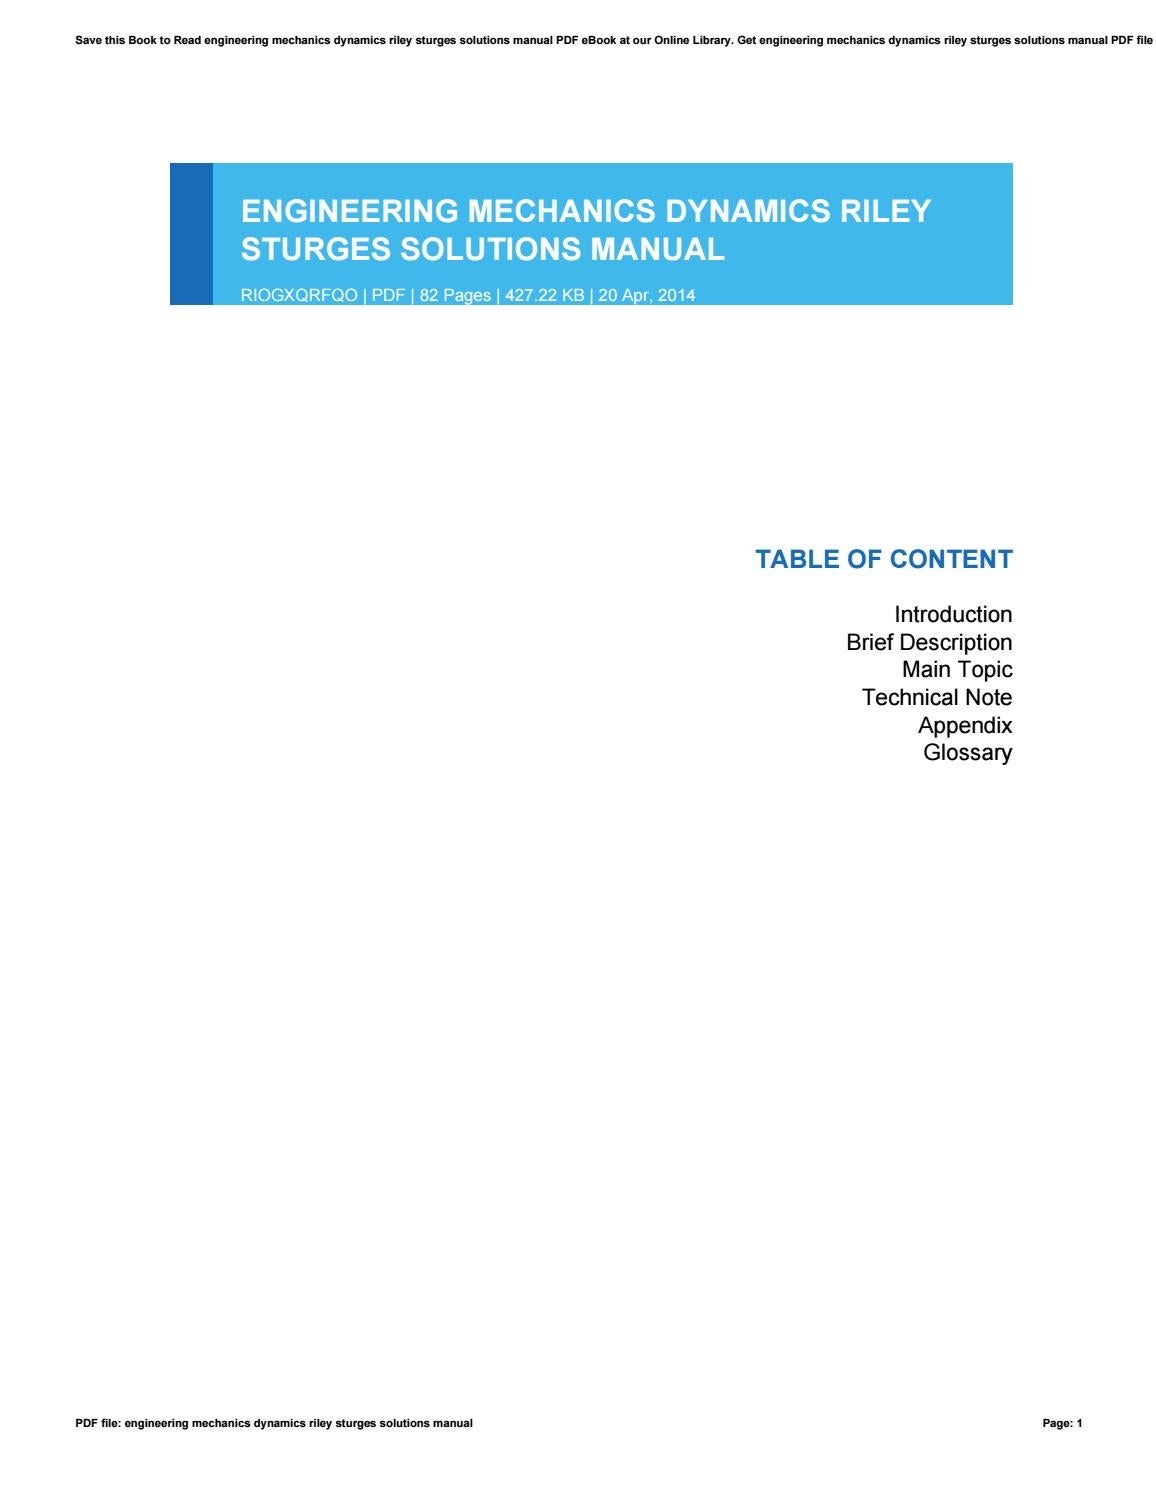 Engineering mechanics dynamics riley sturges solutions manual by  GeraldineMcKinney3824 - issuu